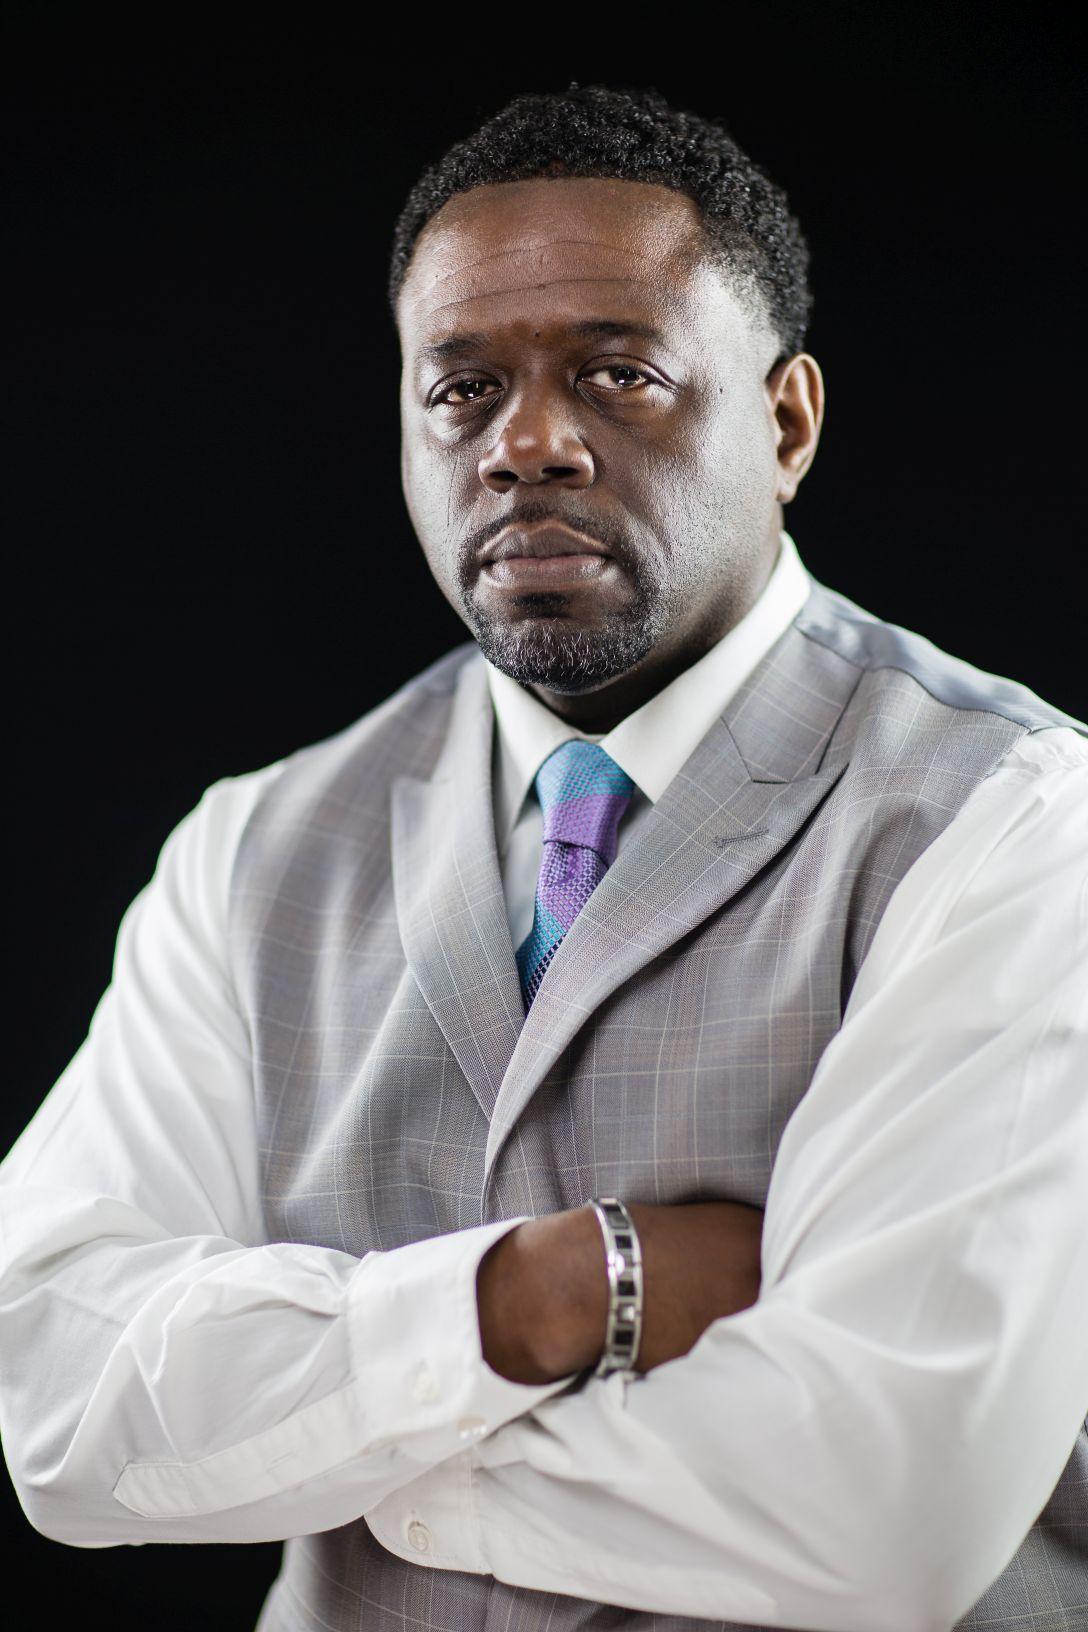 Fayetteville, NC Motivational Speaker - L. Wayne Smalls